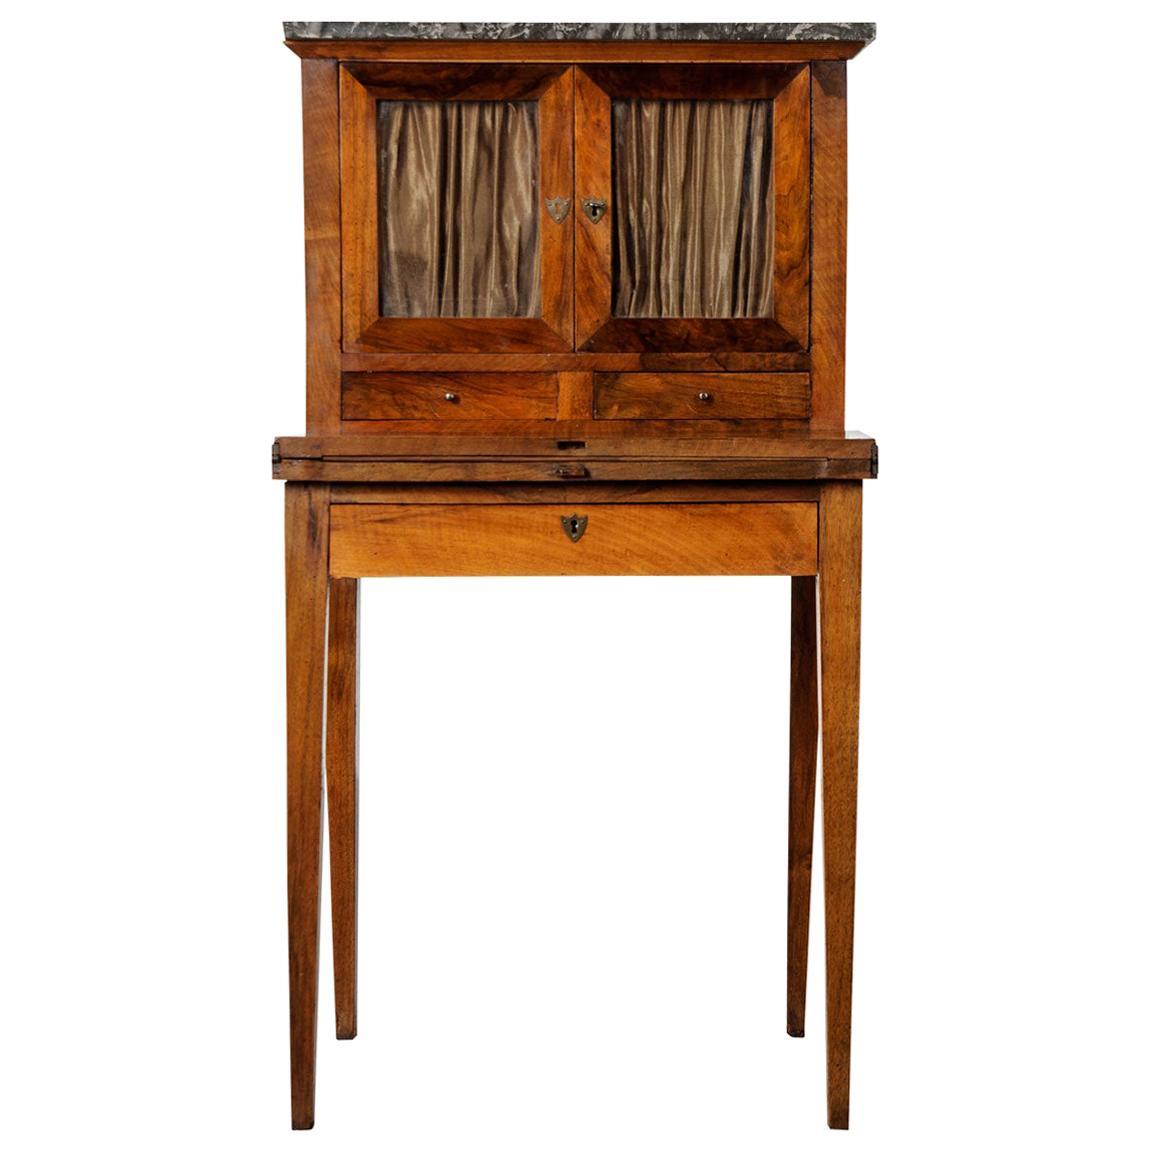 French 19th Century Mahogany Ladies Desk